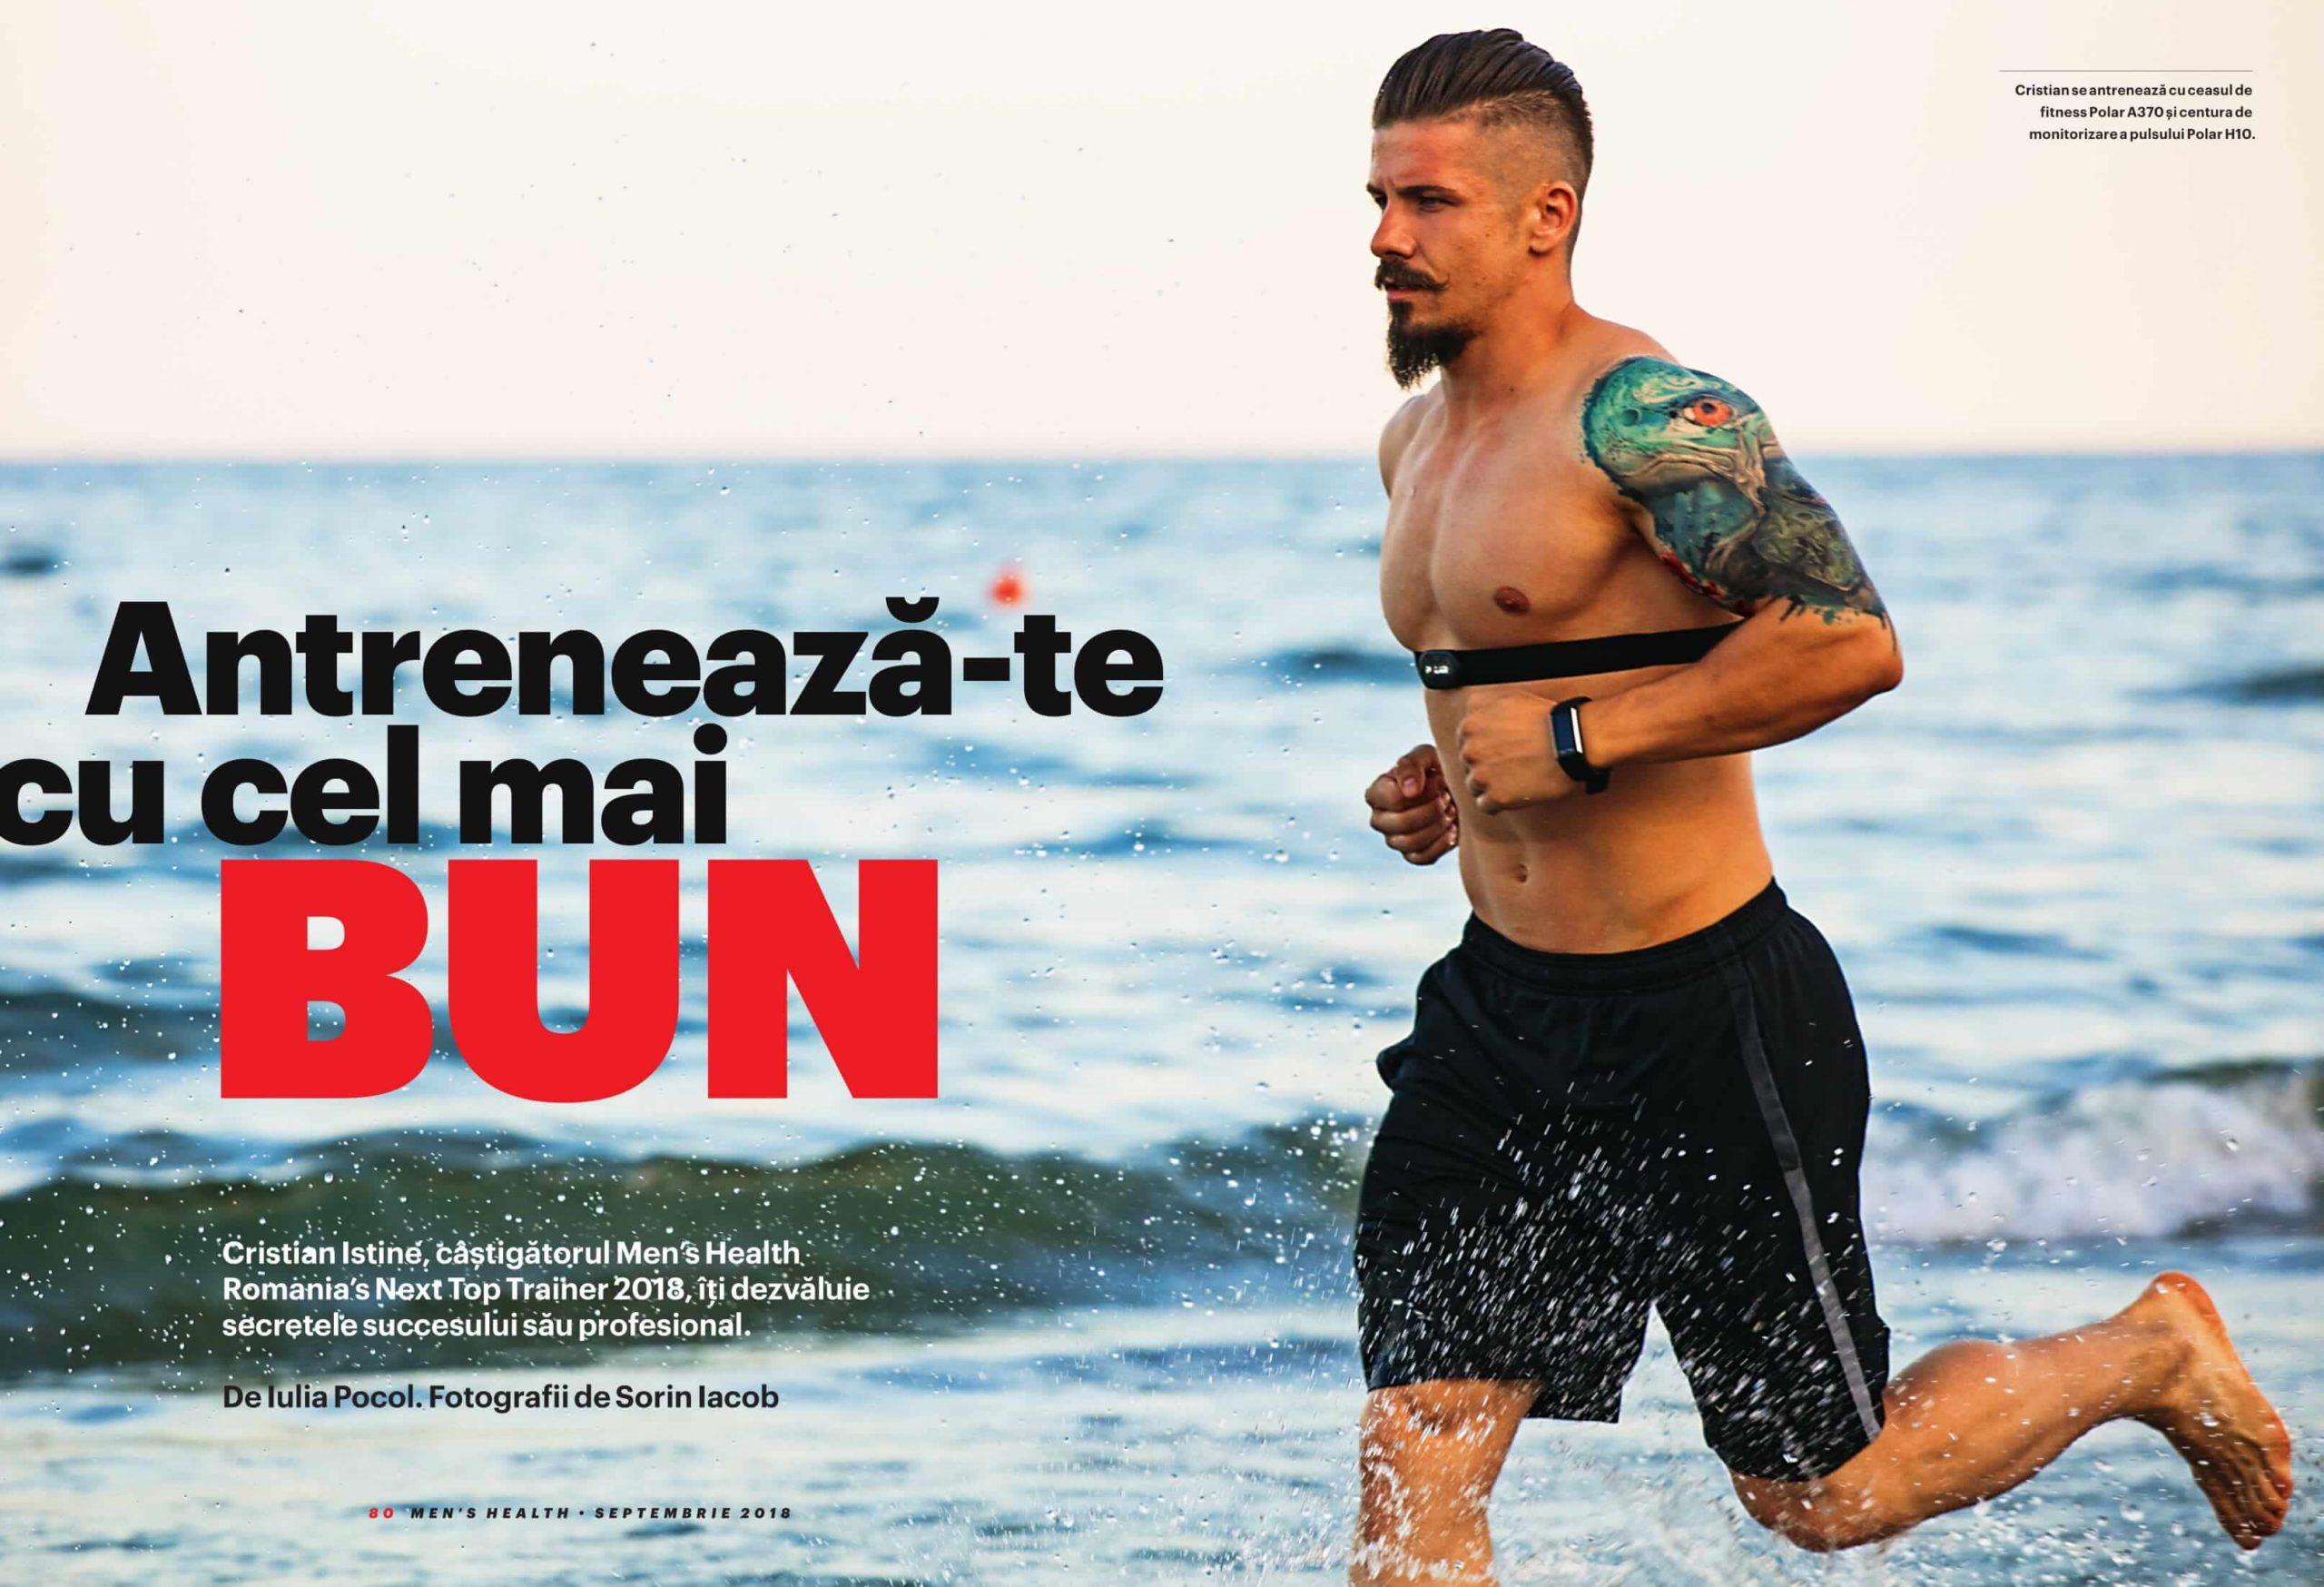 Cristian Istine - Fitness Expert - CASTIGATORUL MEN'S HEALTH ROMANIA NEXT TOP TRAINER 2018